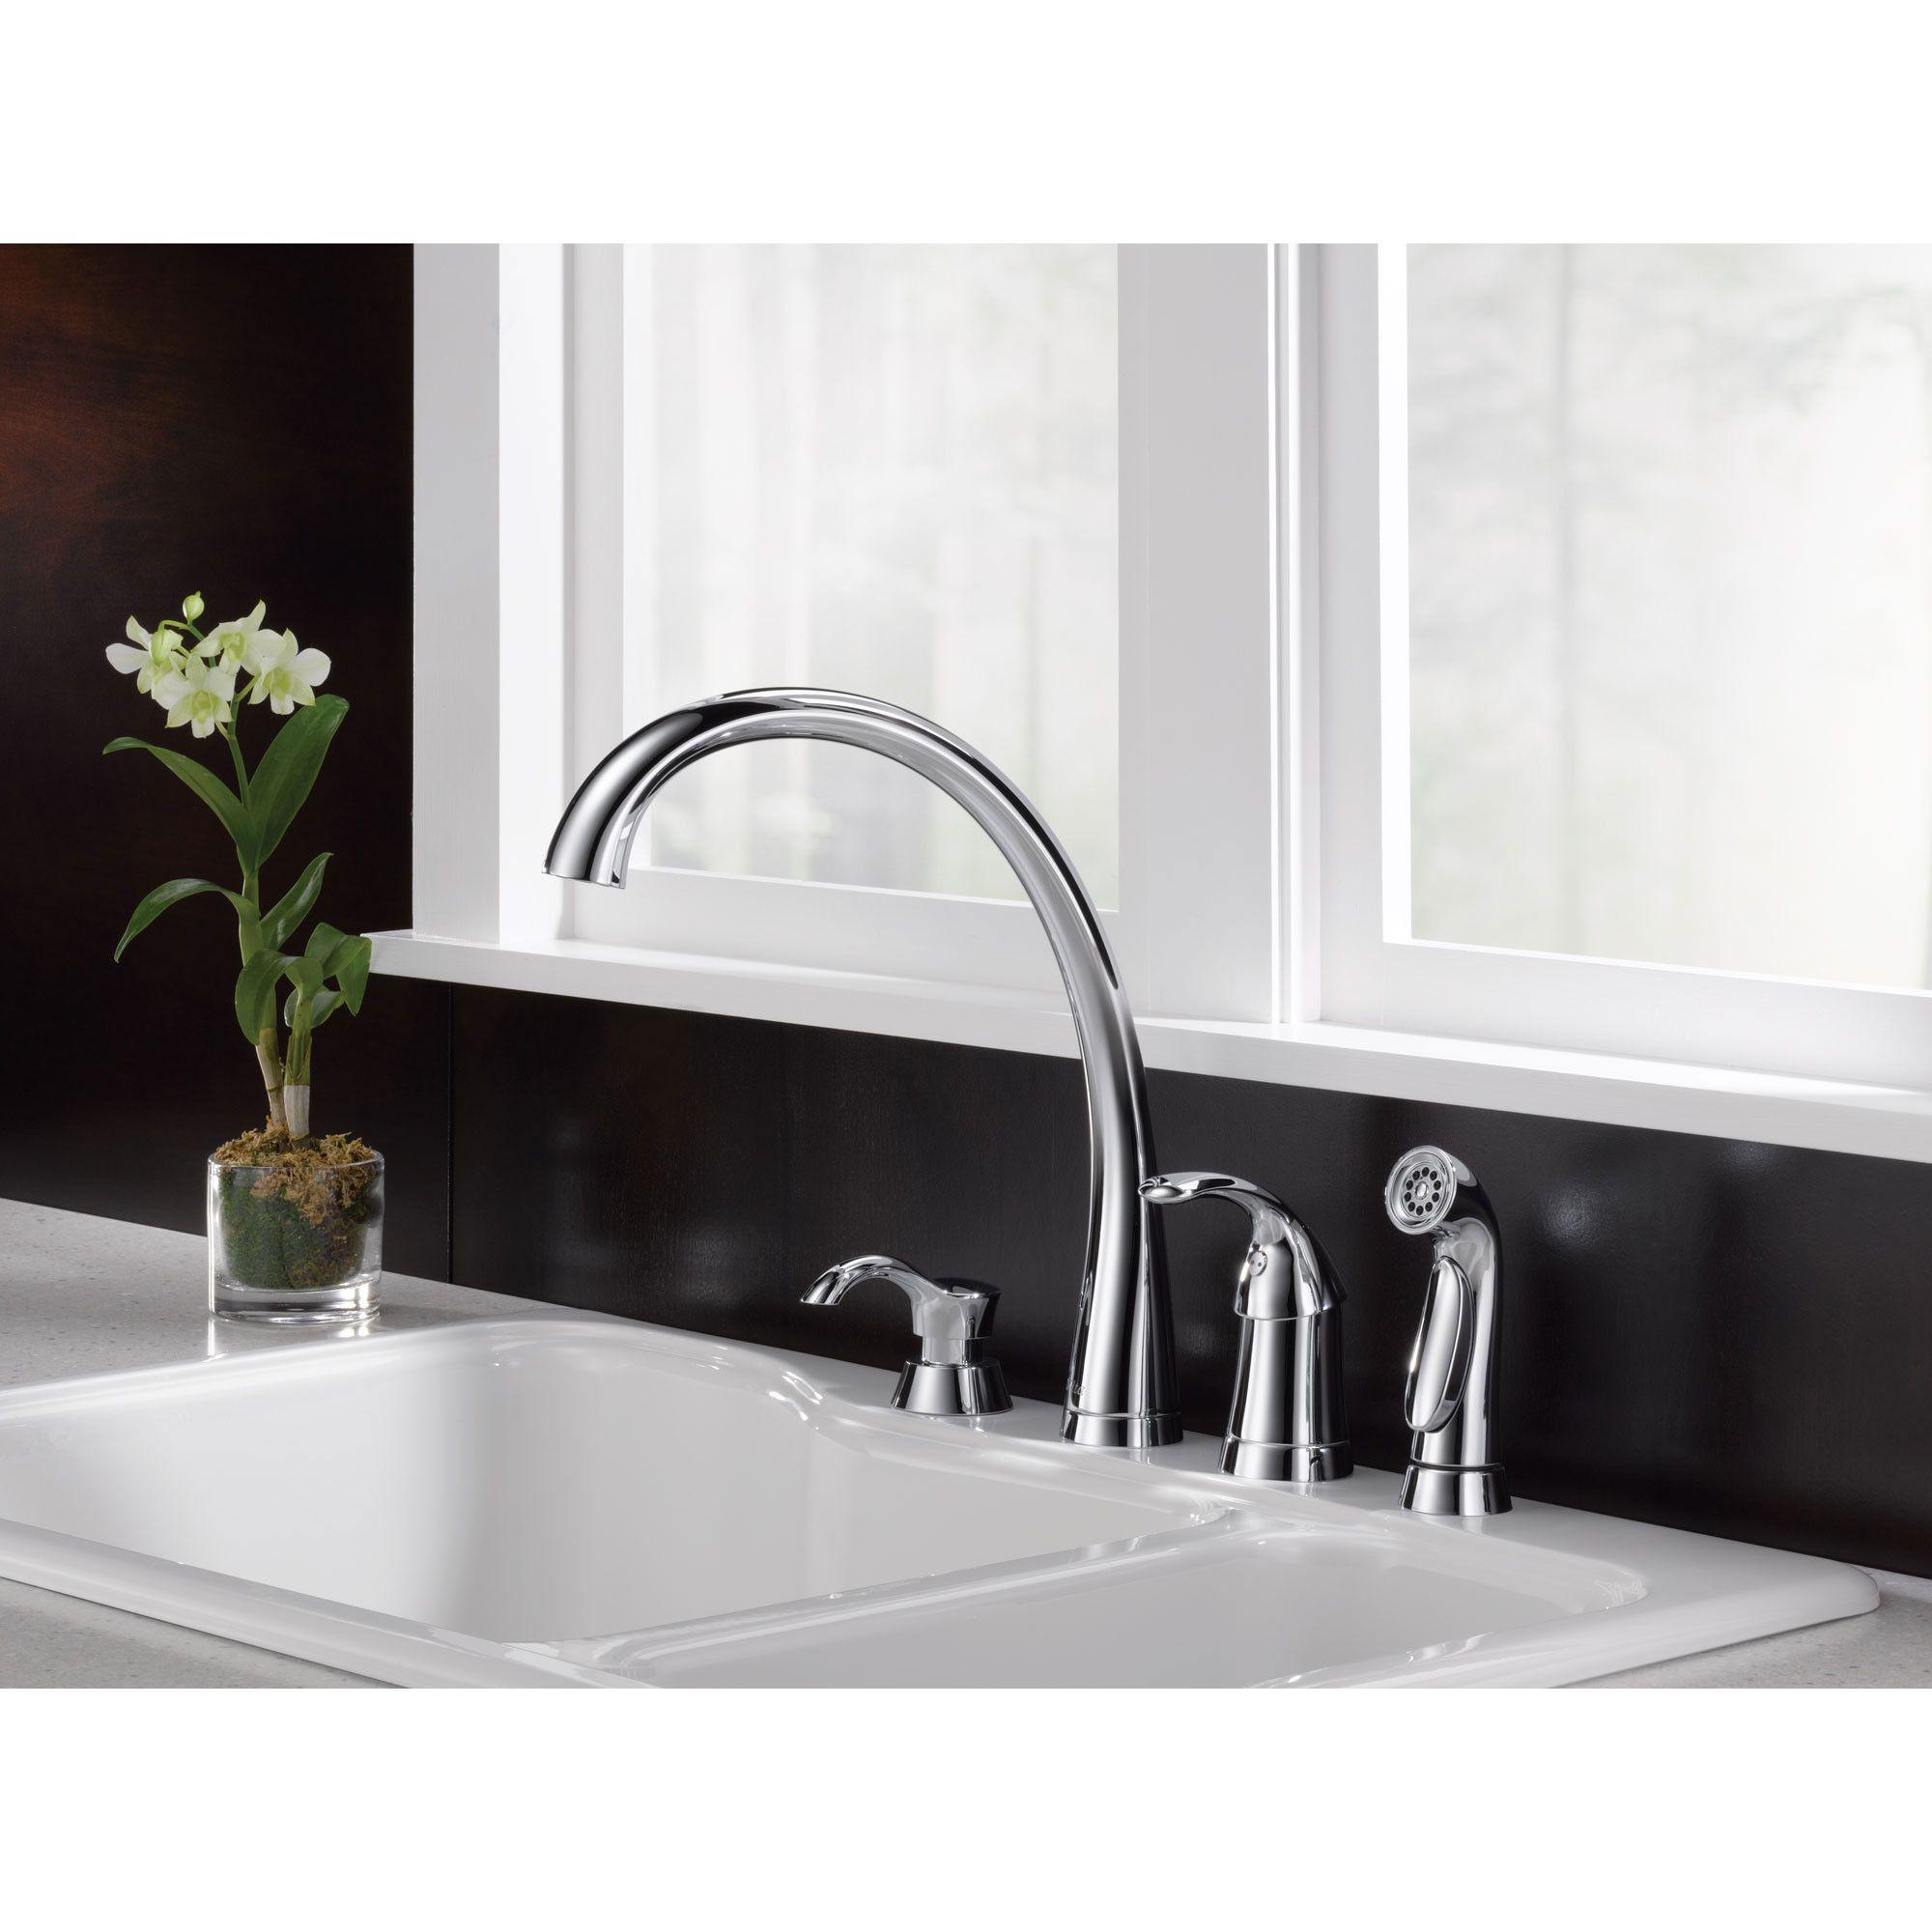 Delta Chrome Finish Pilar Modern Single Handle Kitchen Sink Faucet